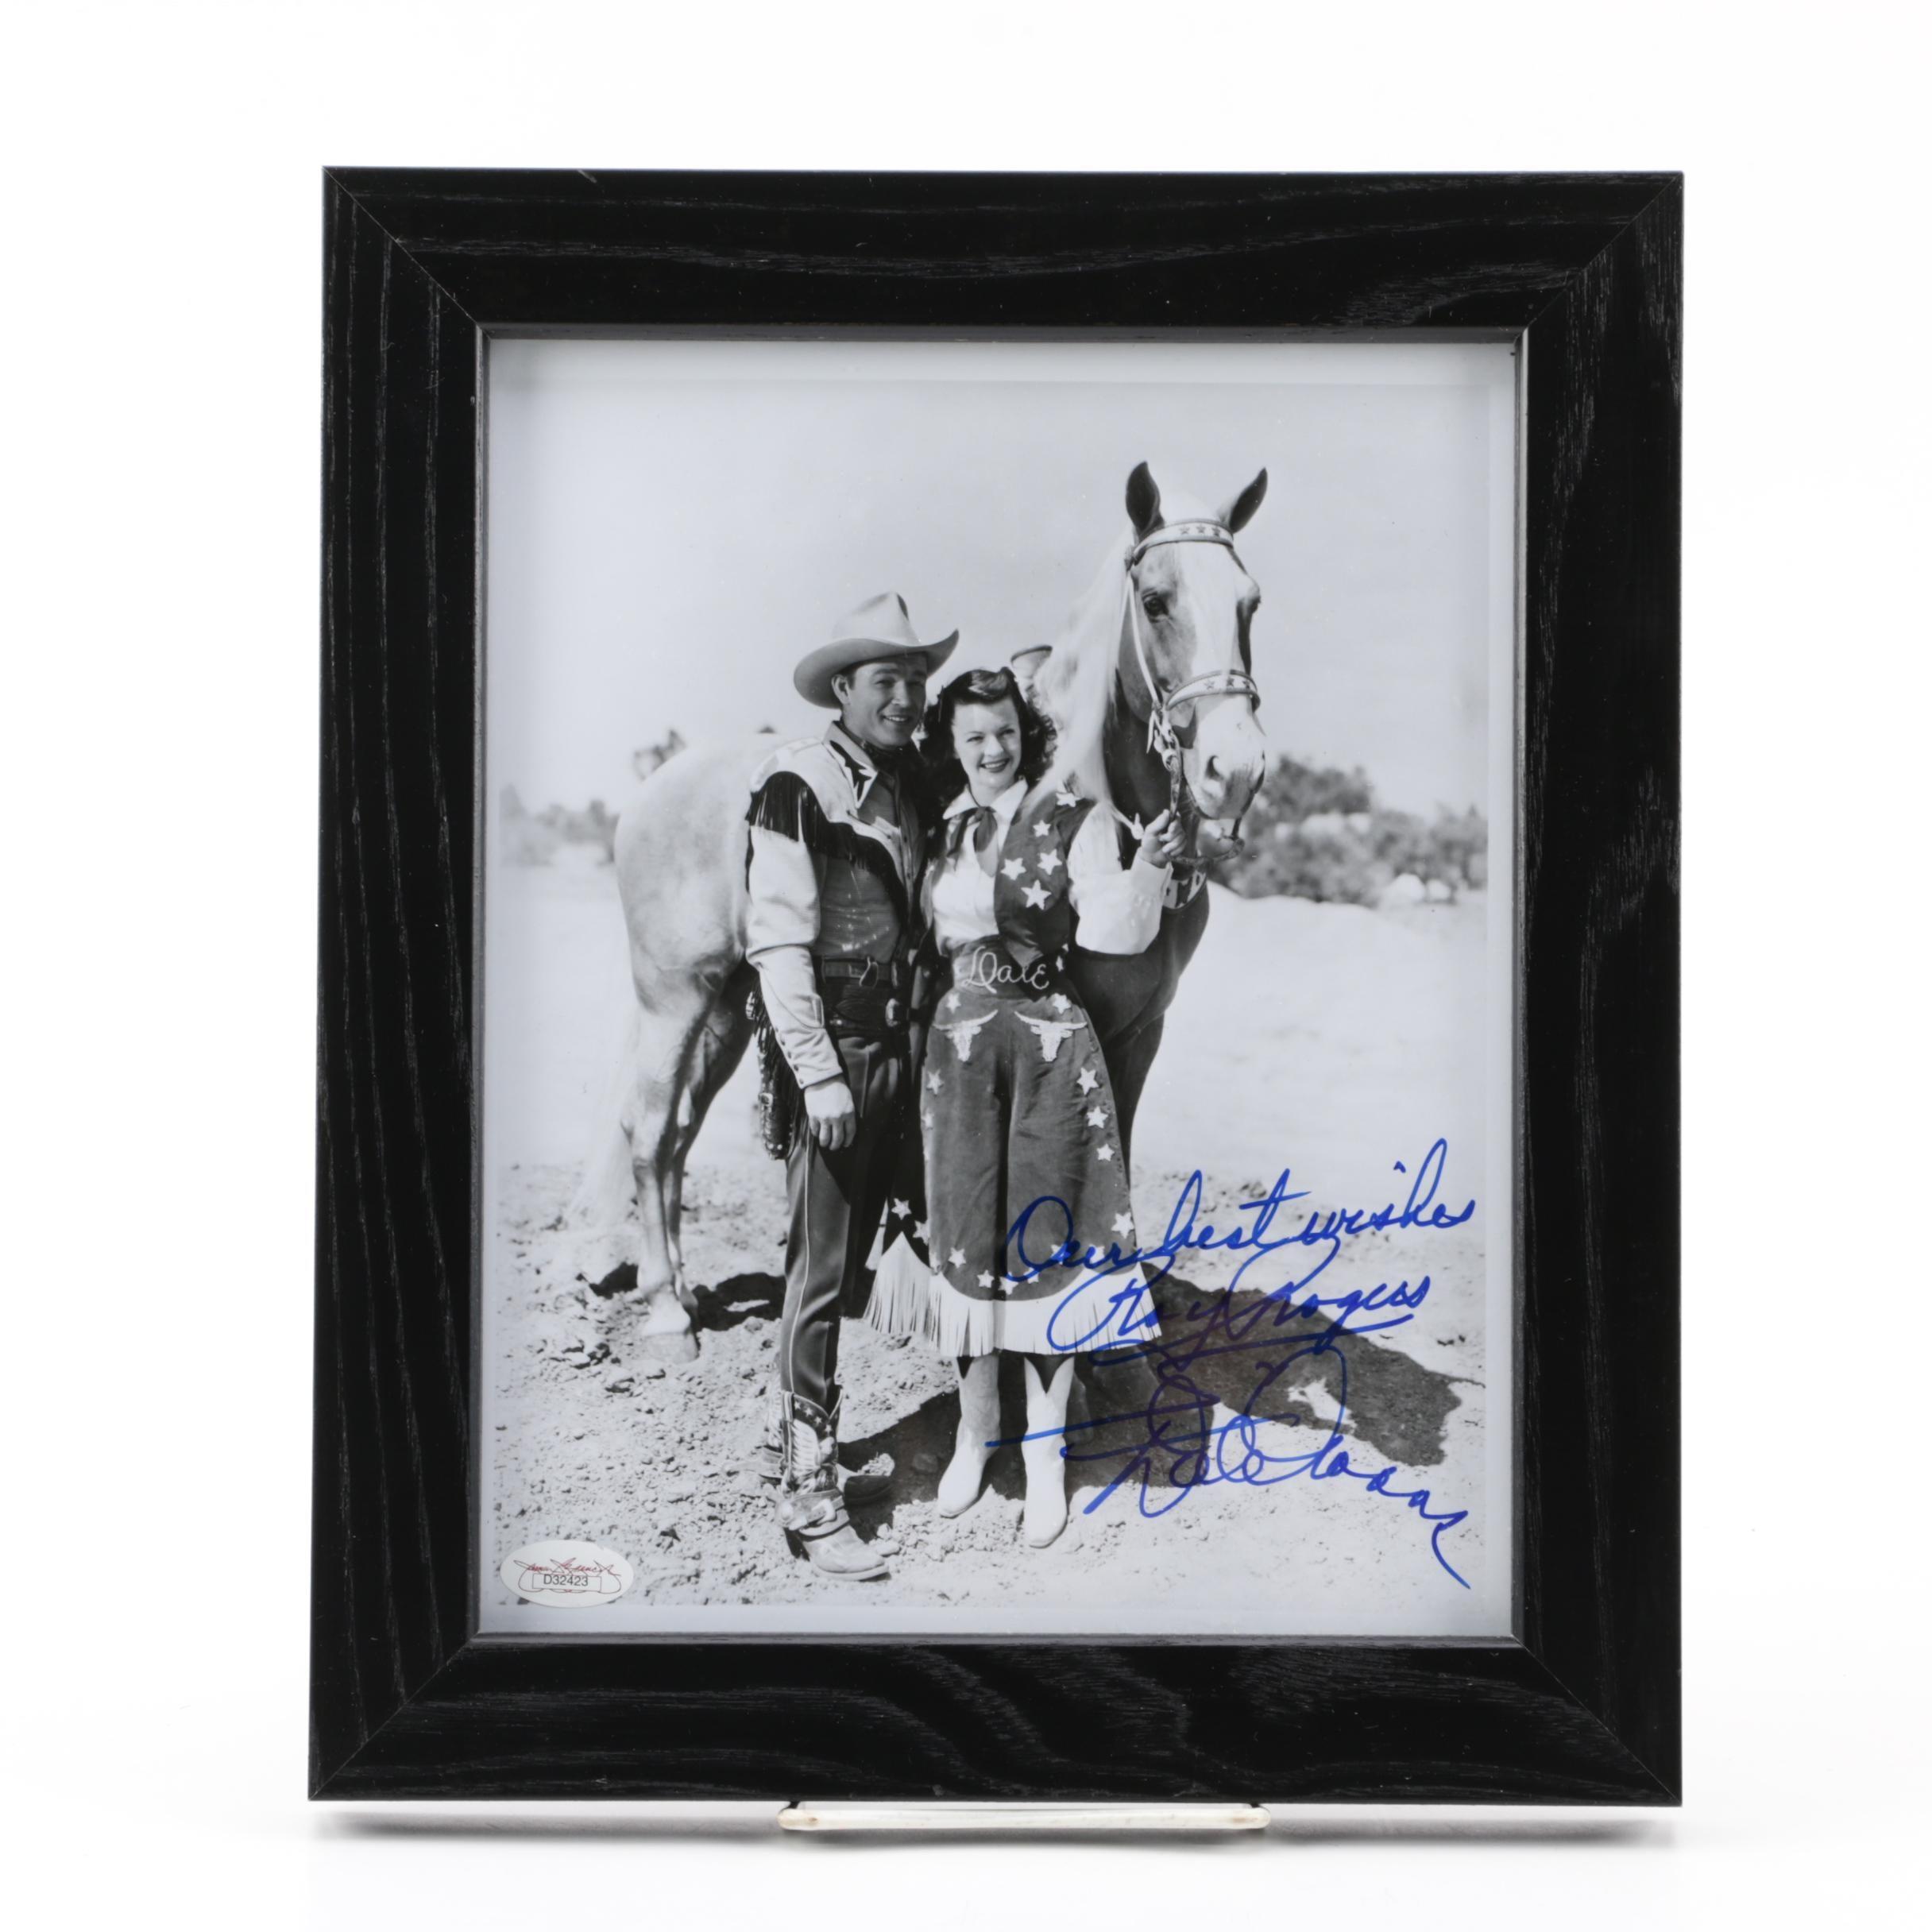 Roy Rogers and Dale Evans Autographed Photograph, JSA COA